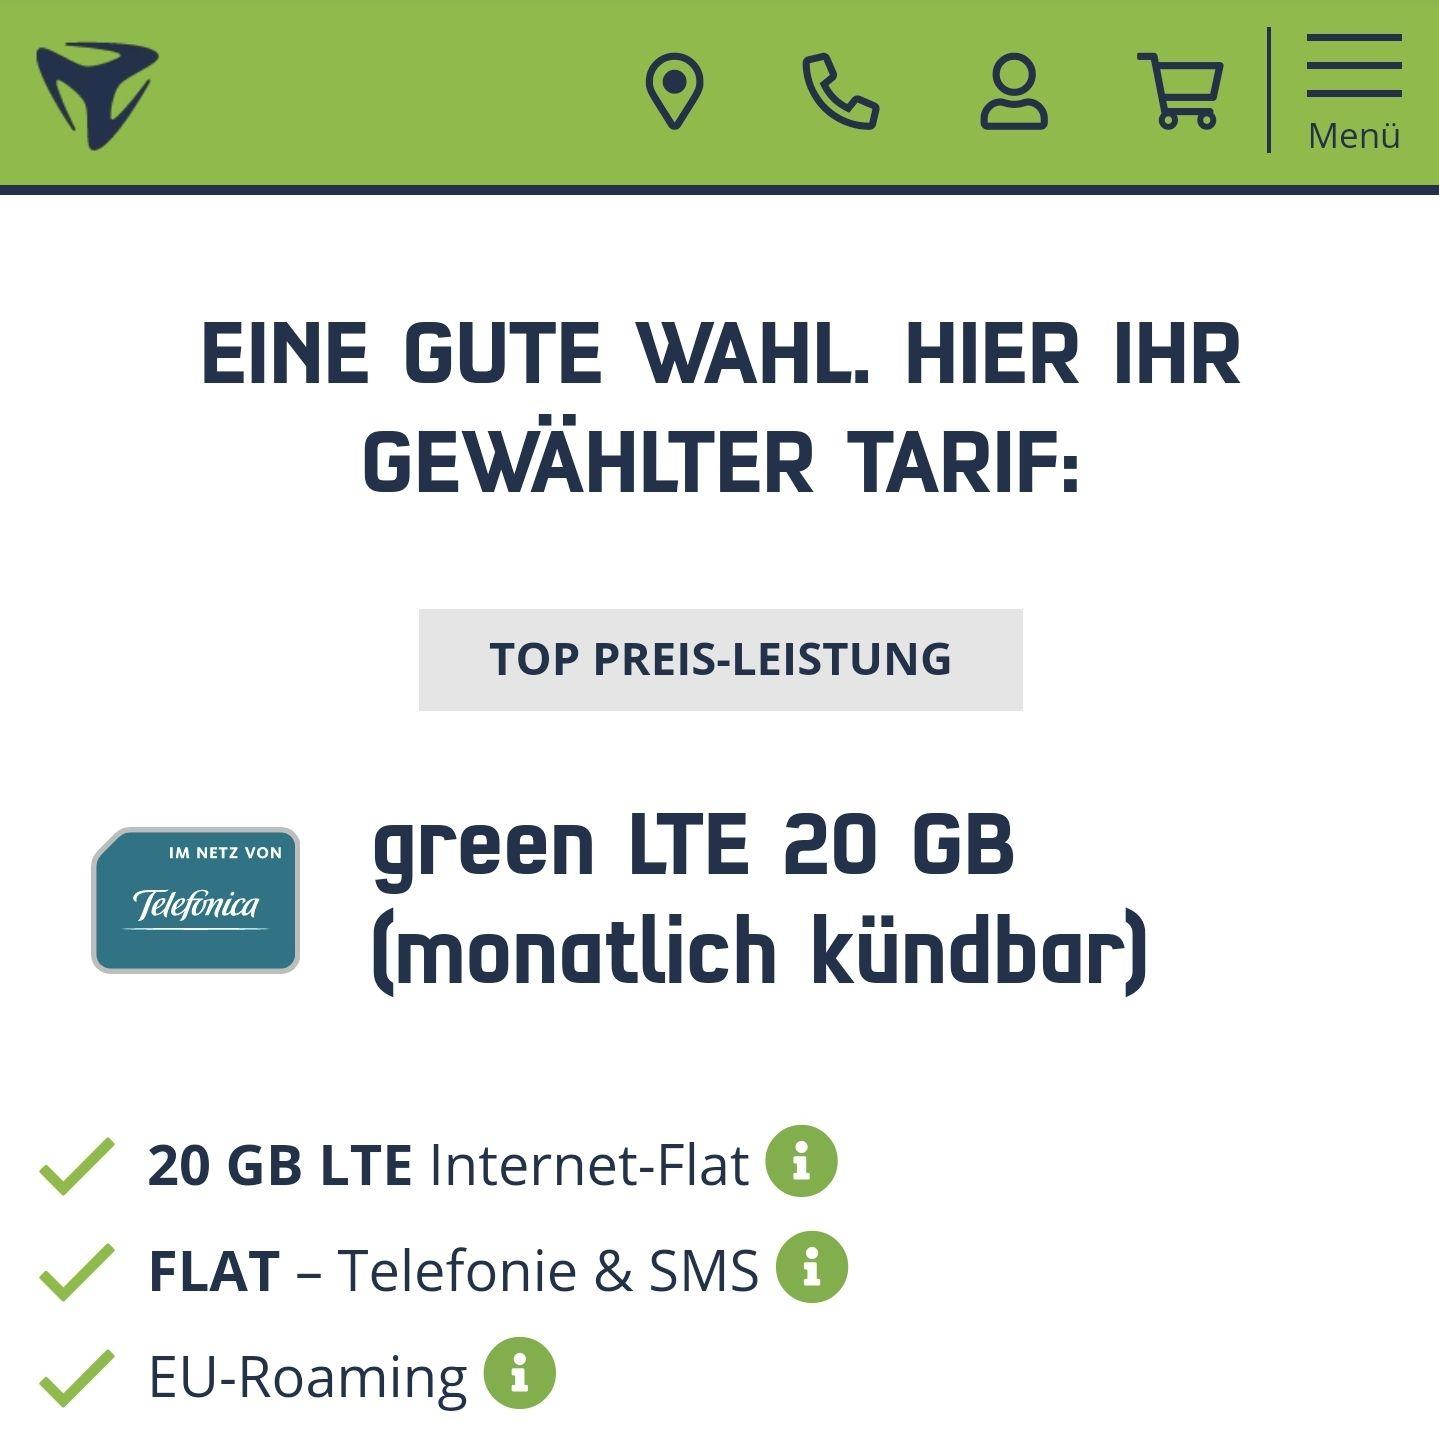 mD green LTE 20GB